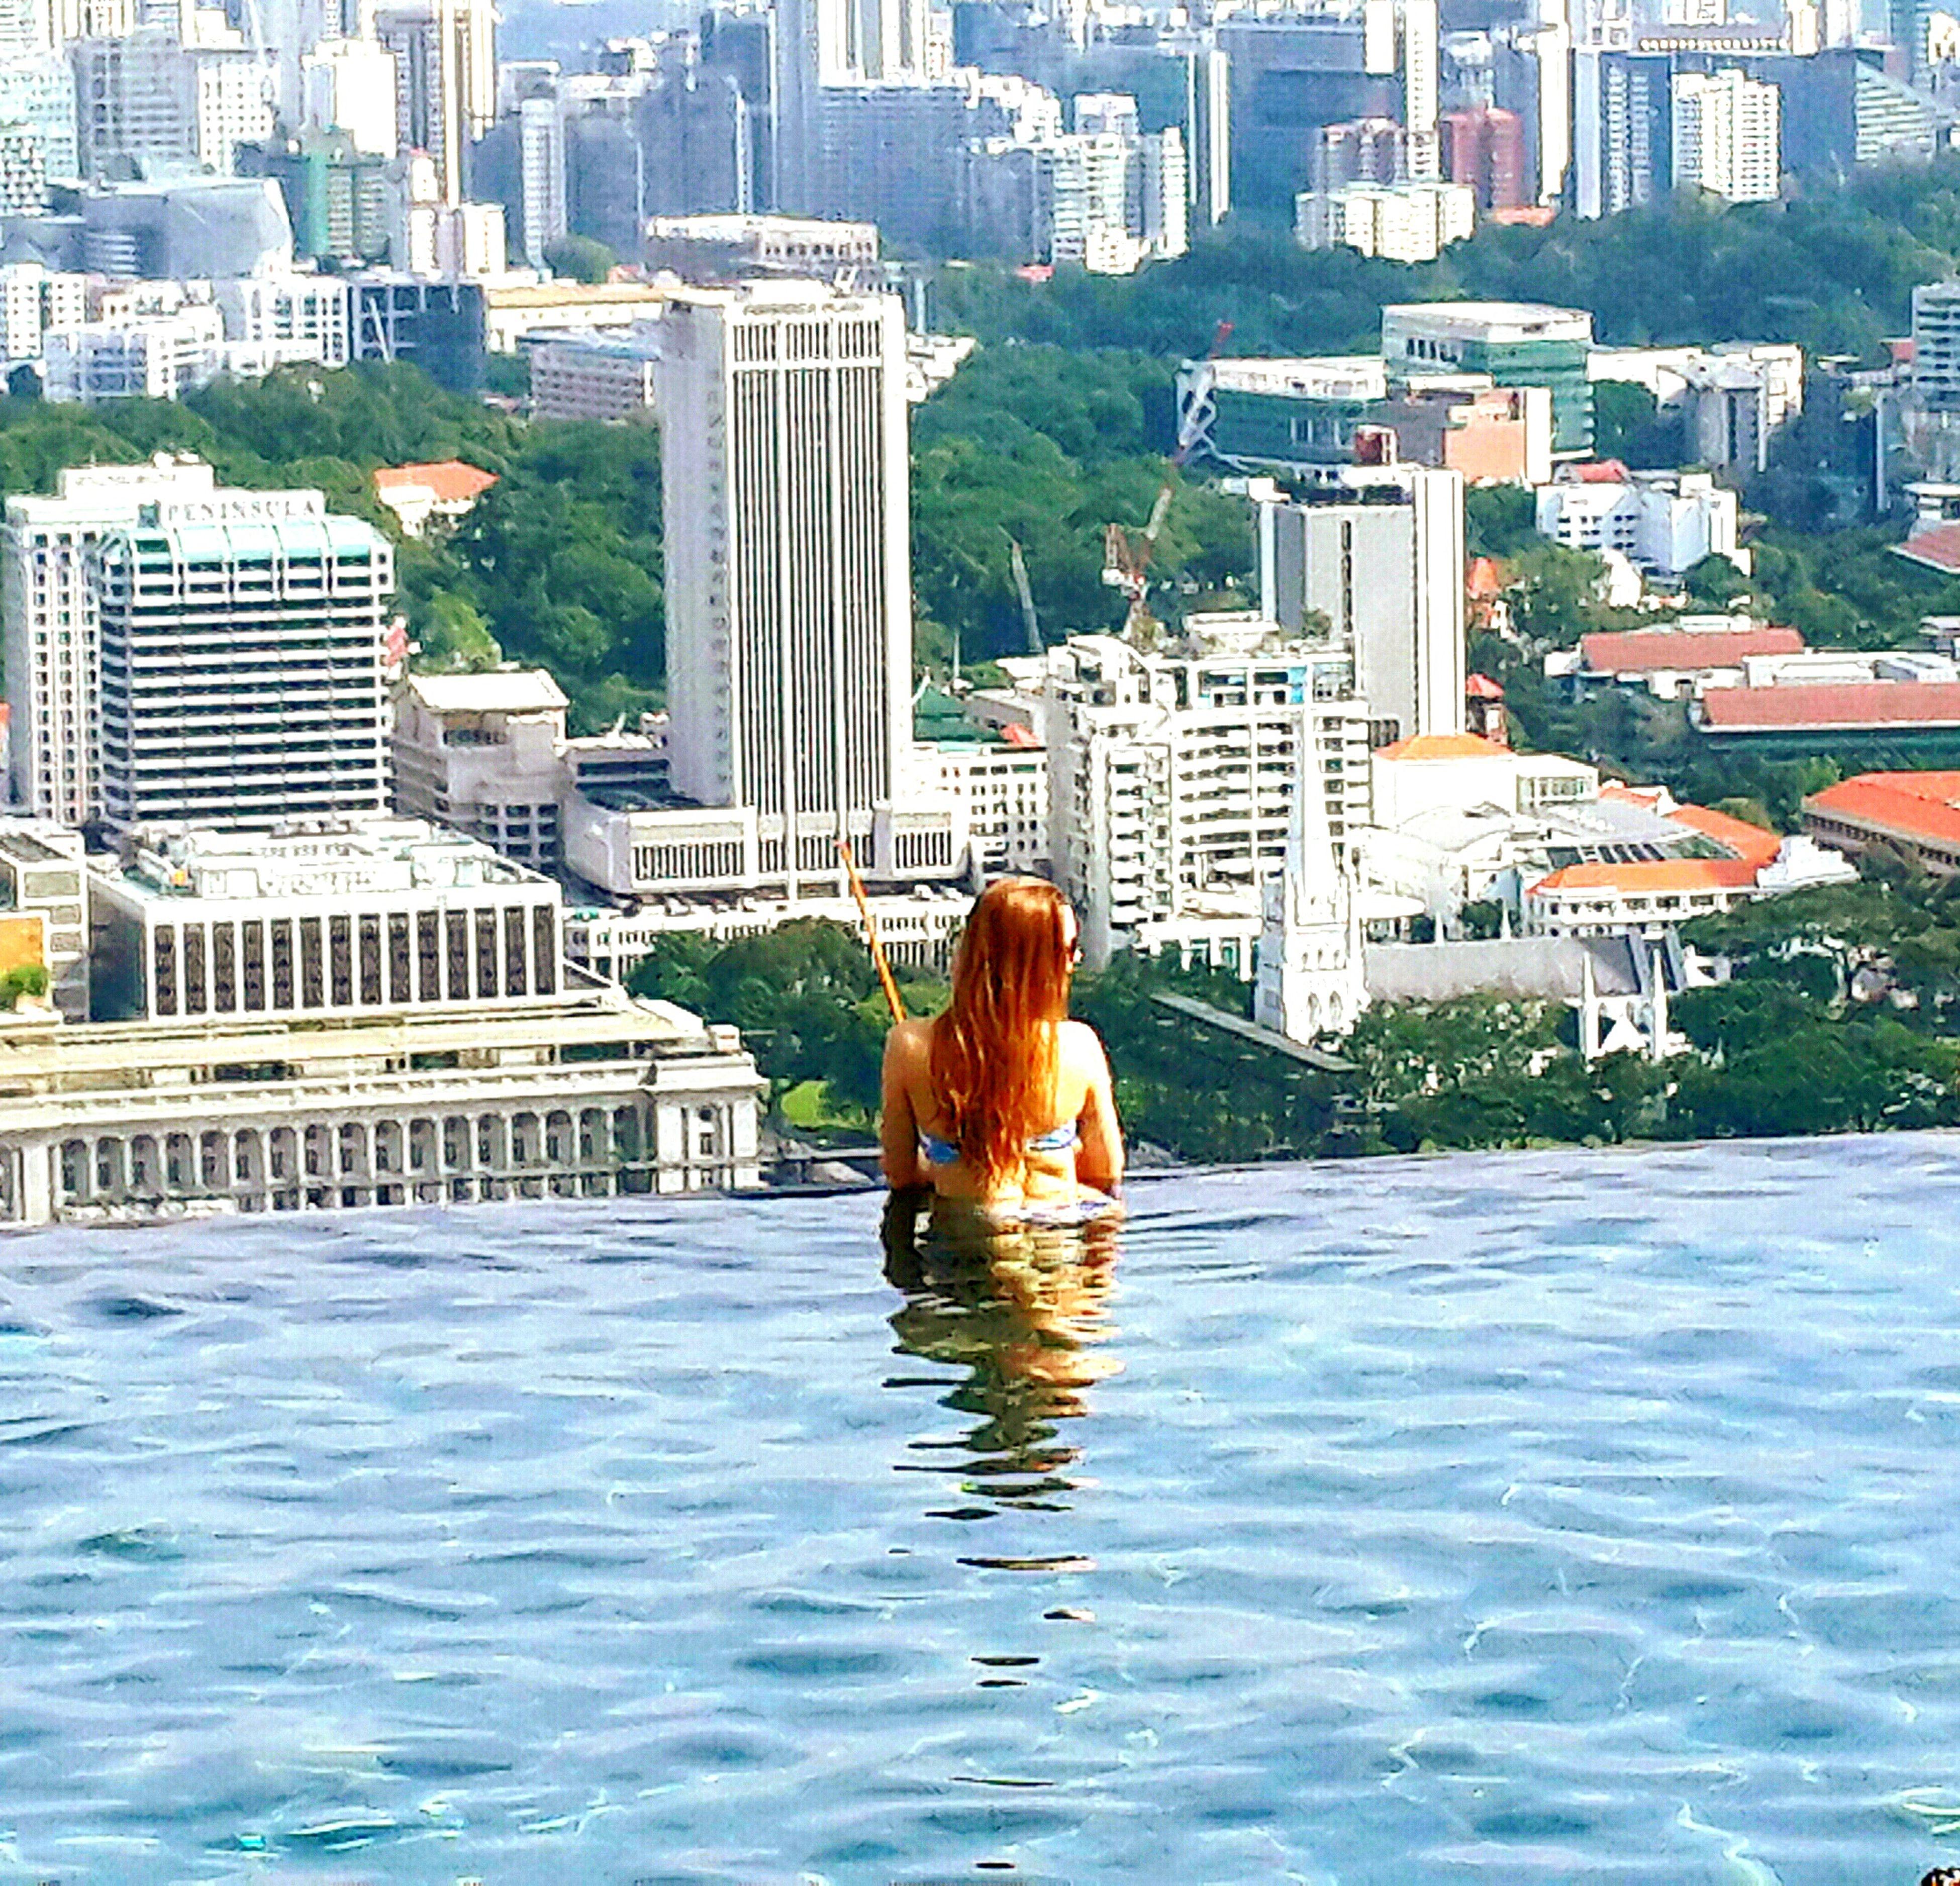 Eyeem Best Shots.- MBS Urban Geometry Swimming Pool Water Reflection Relaxing Time Enjoying Life